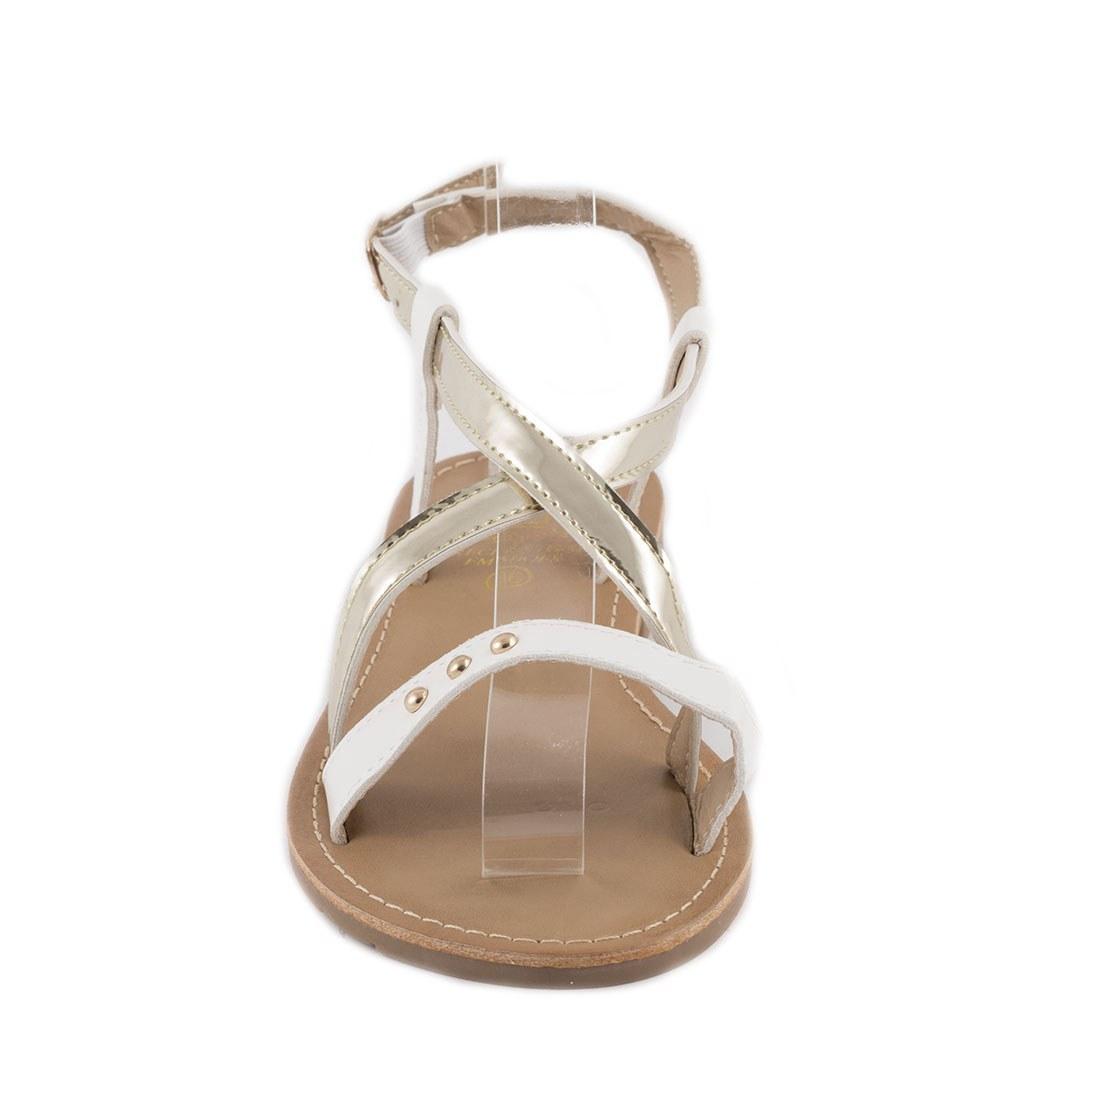 Sandale dama cu barete F-04-ALB